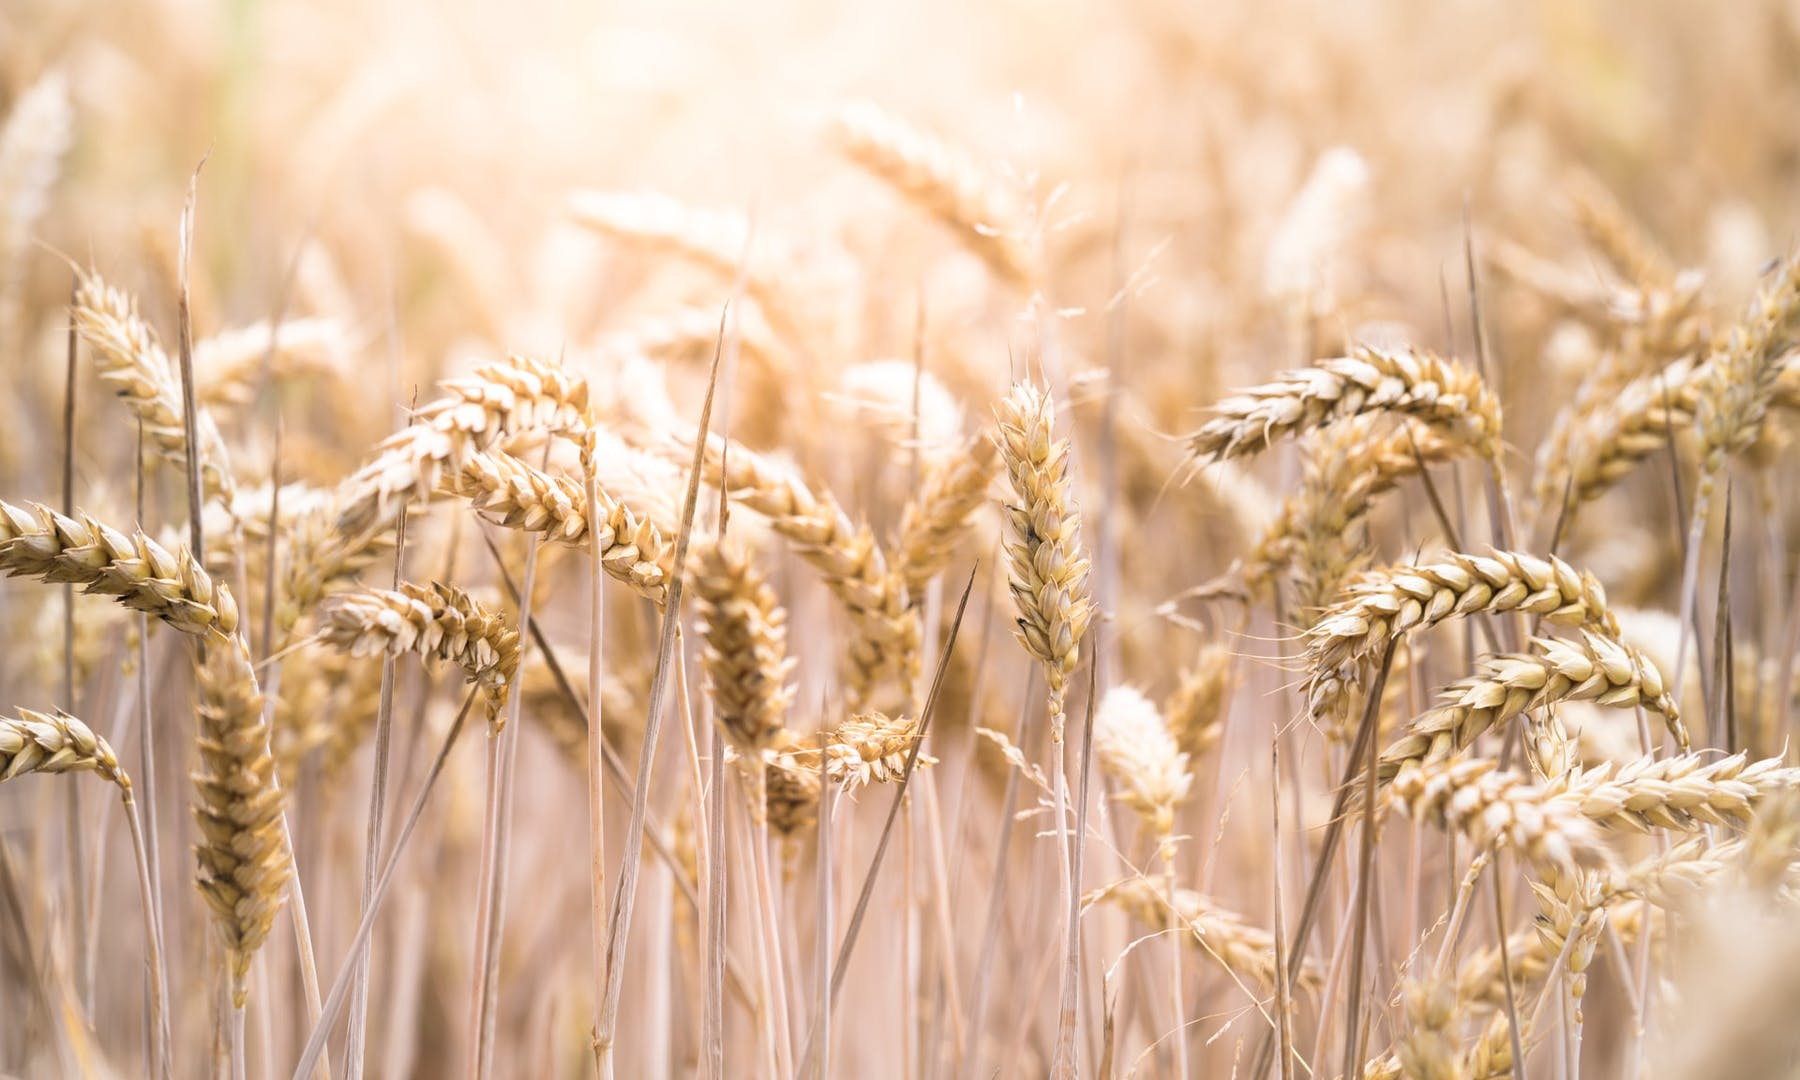 wheat, rye, barley, oats, corn, and rice